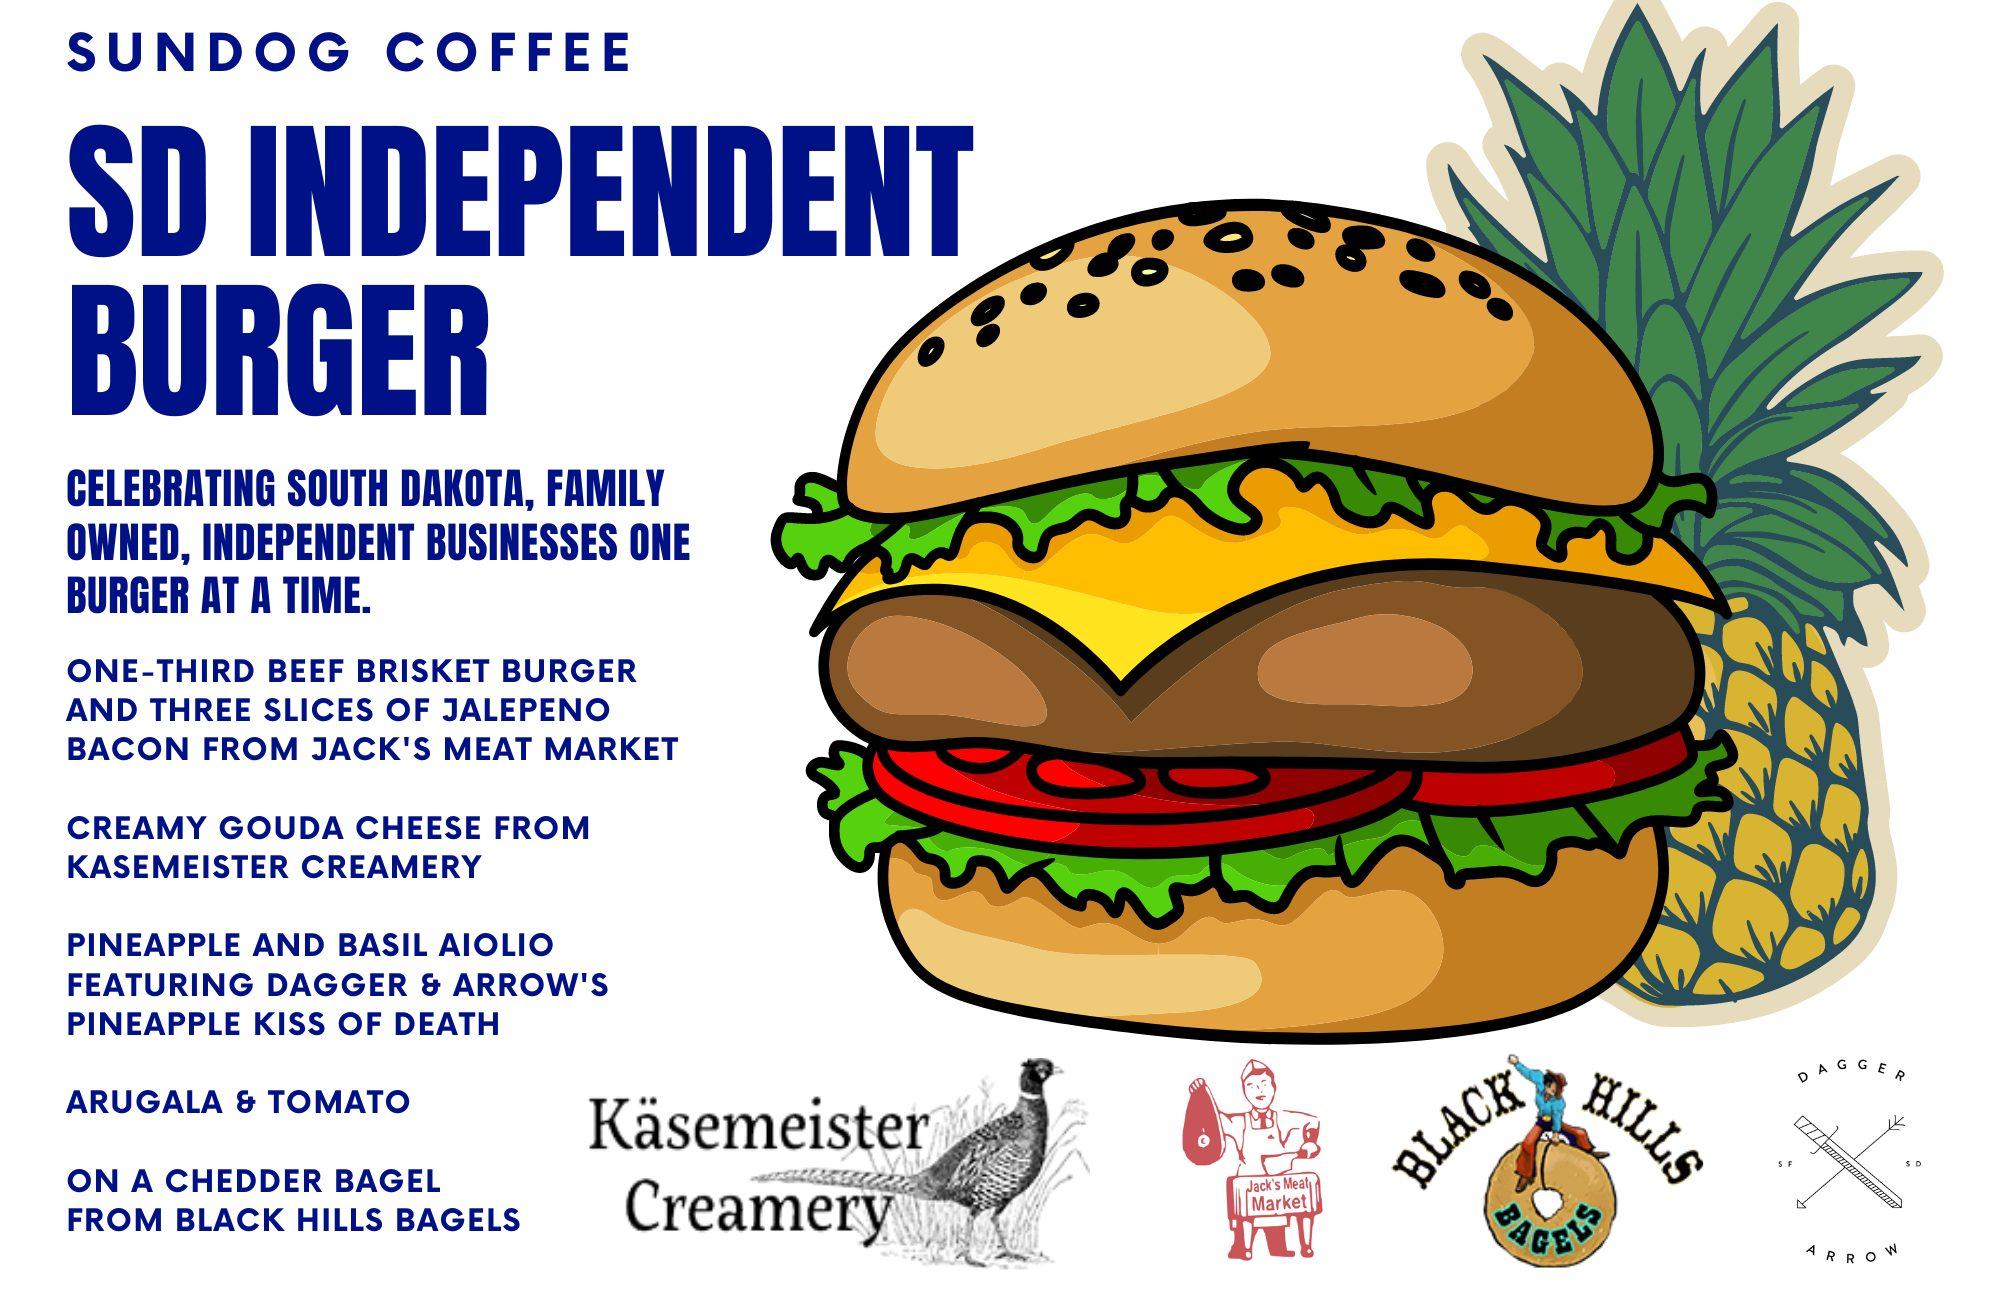 Sundog Coffee SD Independent Burger